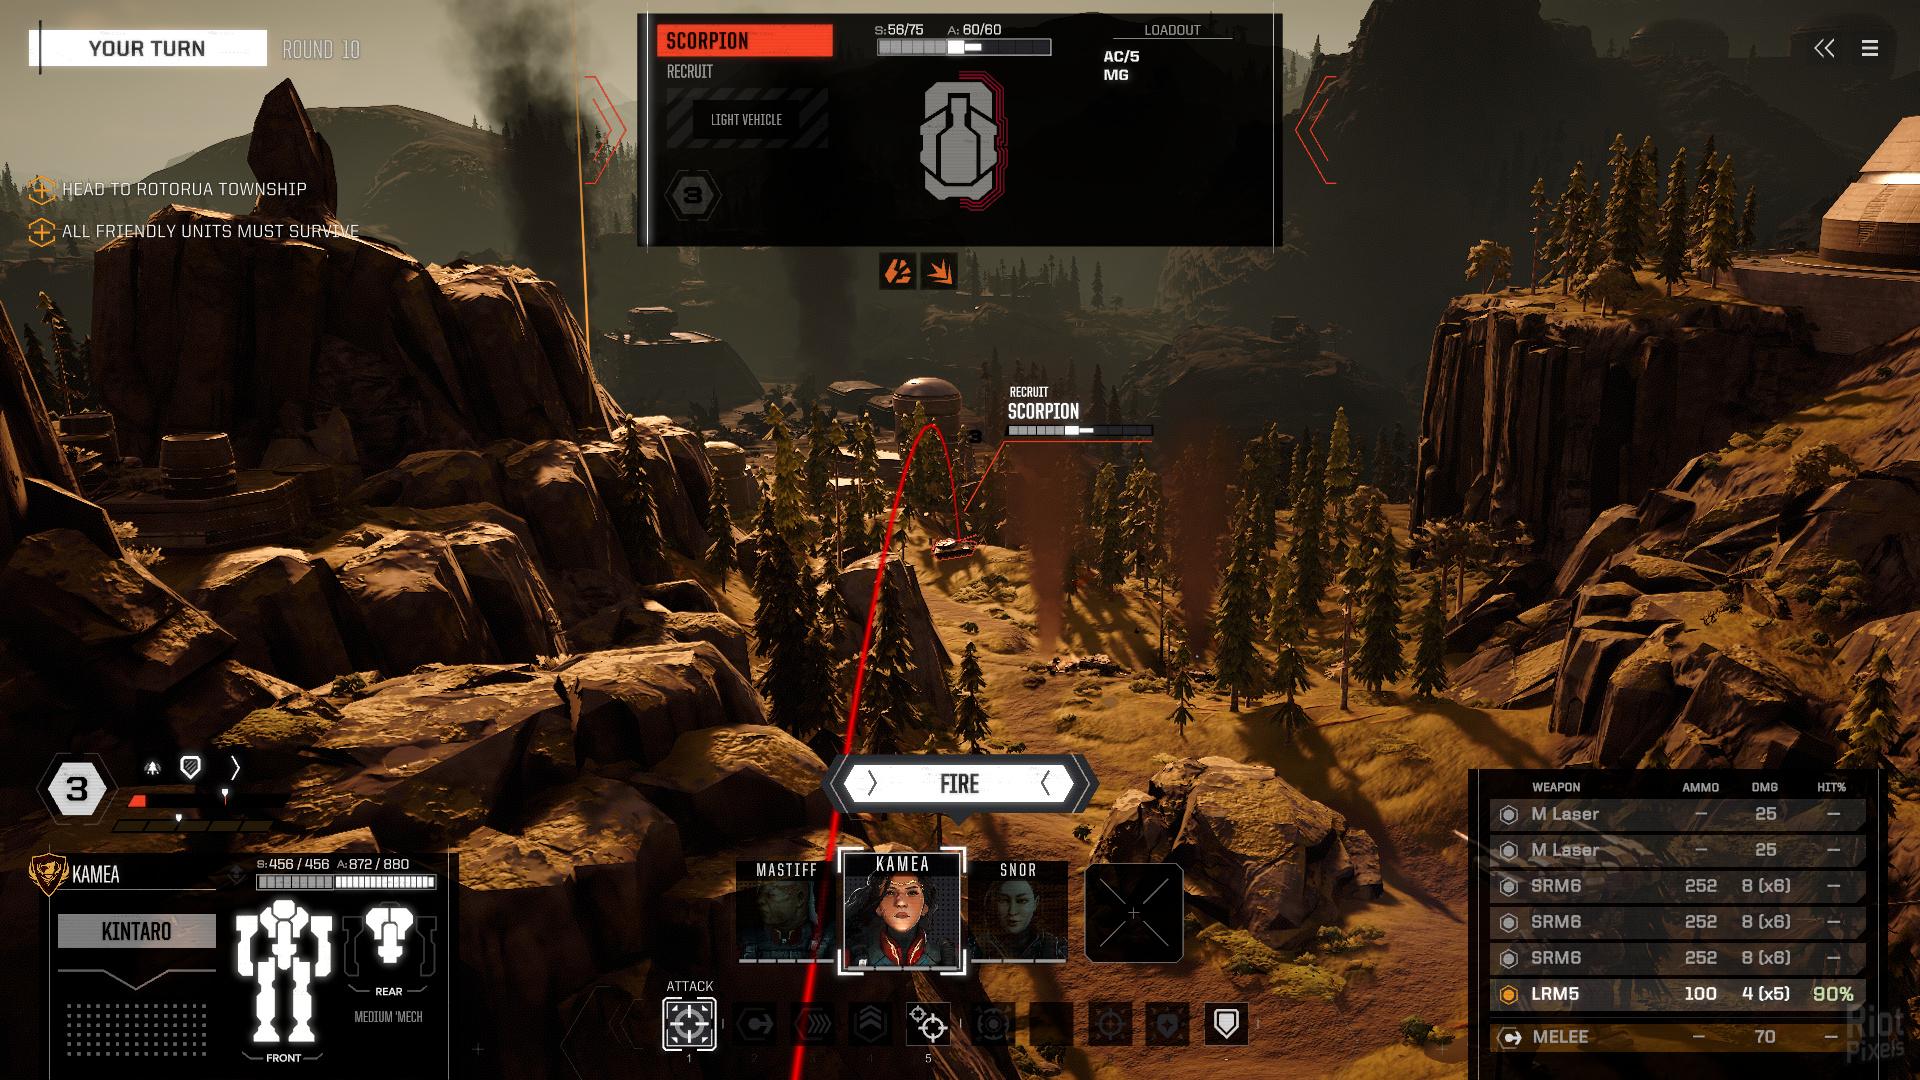 BattleTech - game screenshots at Riot Pixels, images